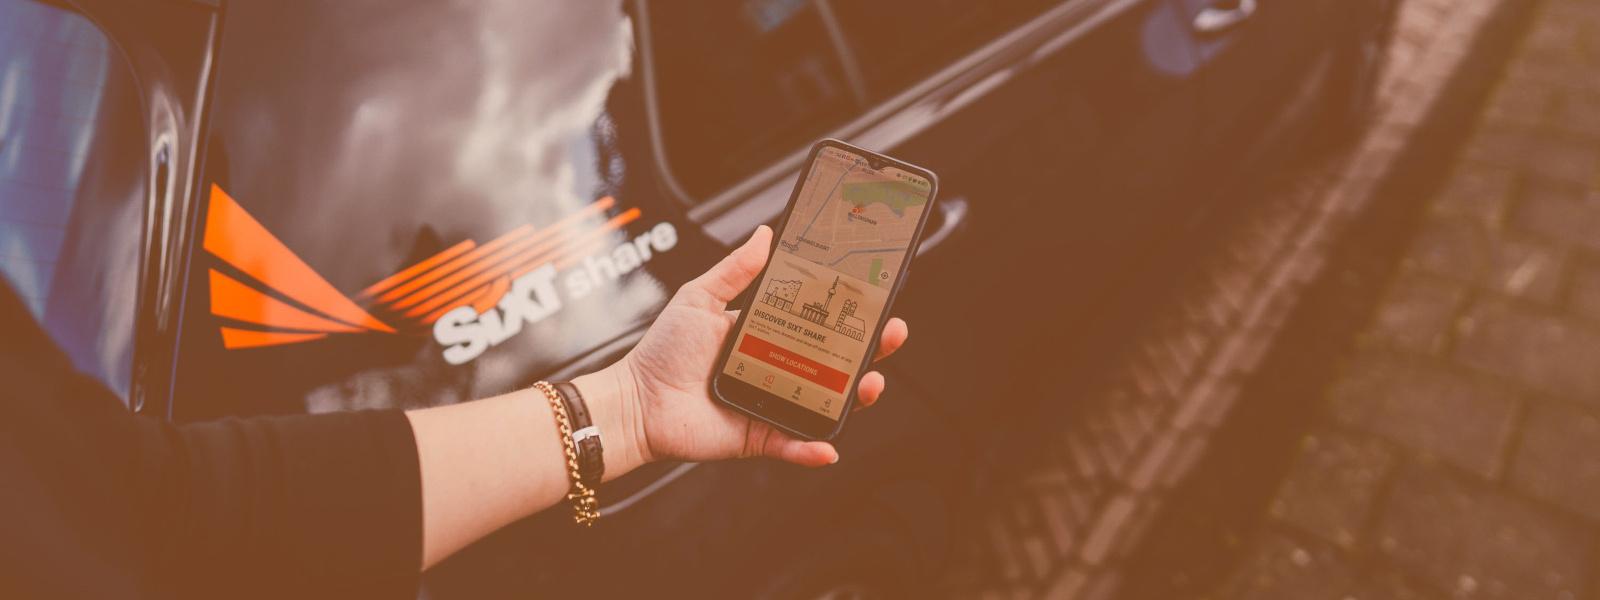 sixt share carsharing tarieven 1